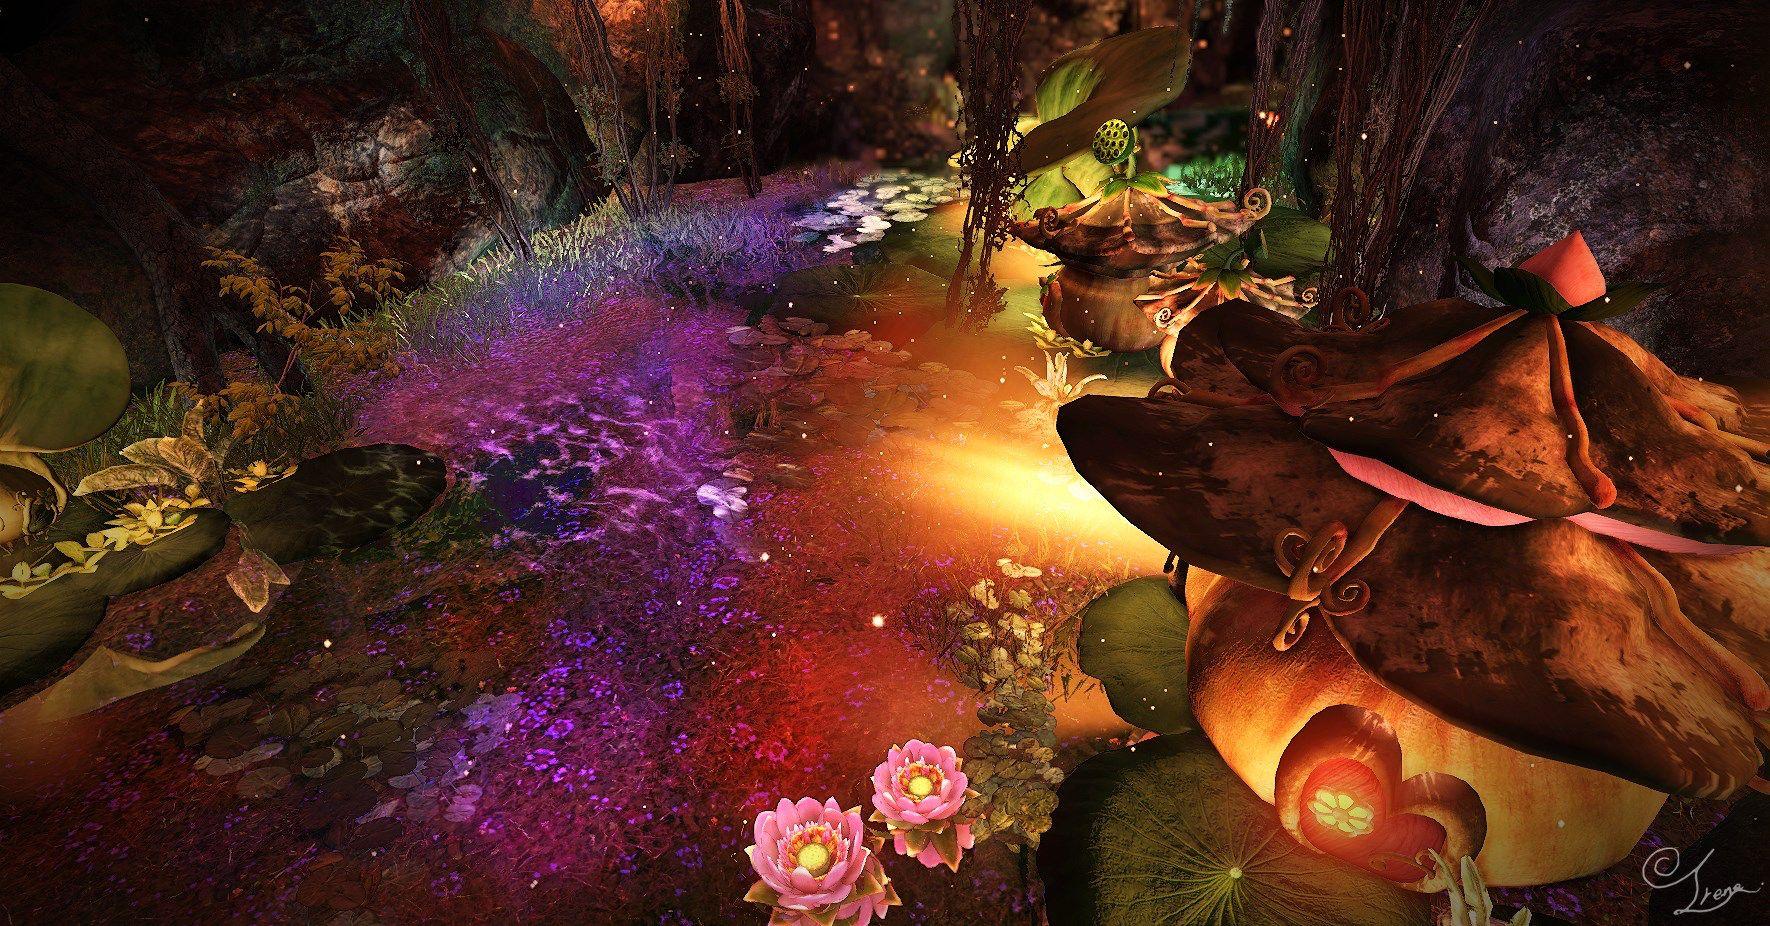 💕Irene's Wonderland💫  천년에 한번 세개의 푸른달이 떠올라   달의 꽃이 피면  거울 속 또 다른 세상의 문이 열리고   하엘과 물의 정령들이 깨어나리라.